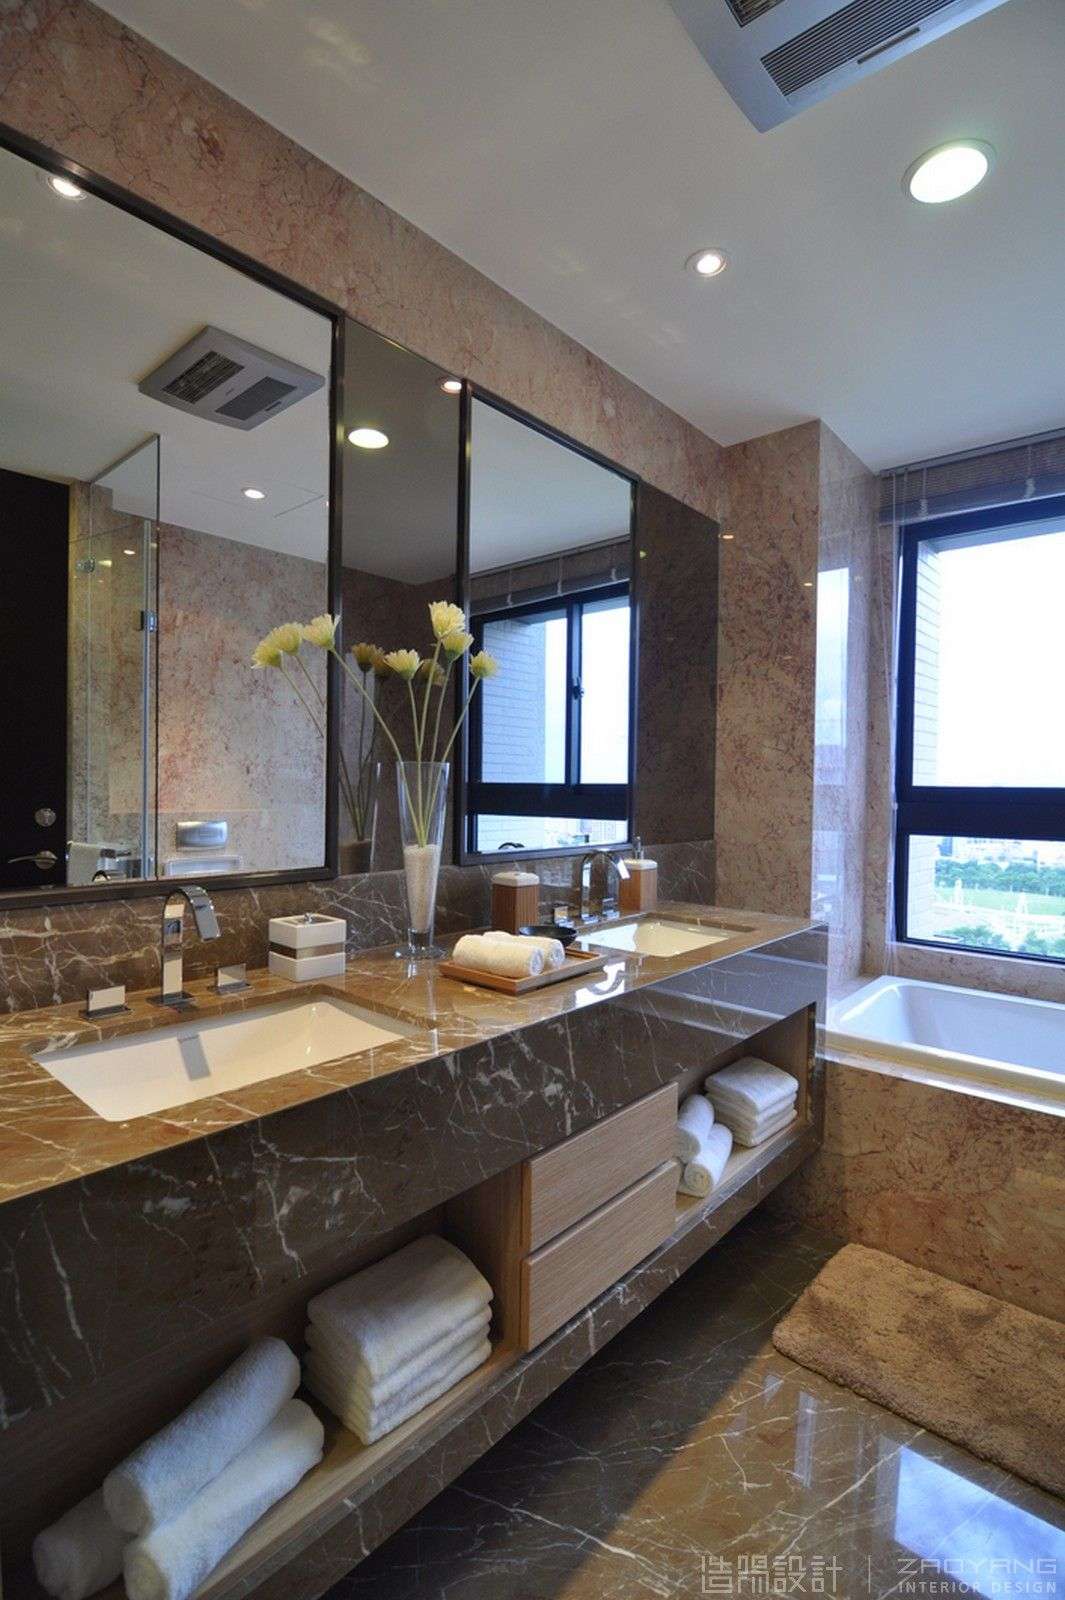 Modern Bathrooms Bathroom Design Luxury Bathroom Design Small